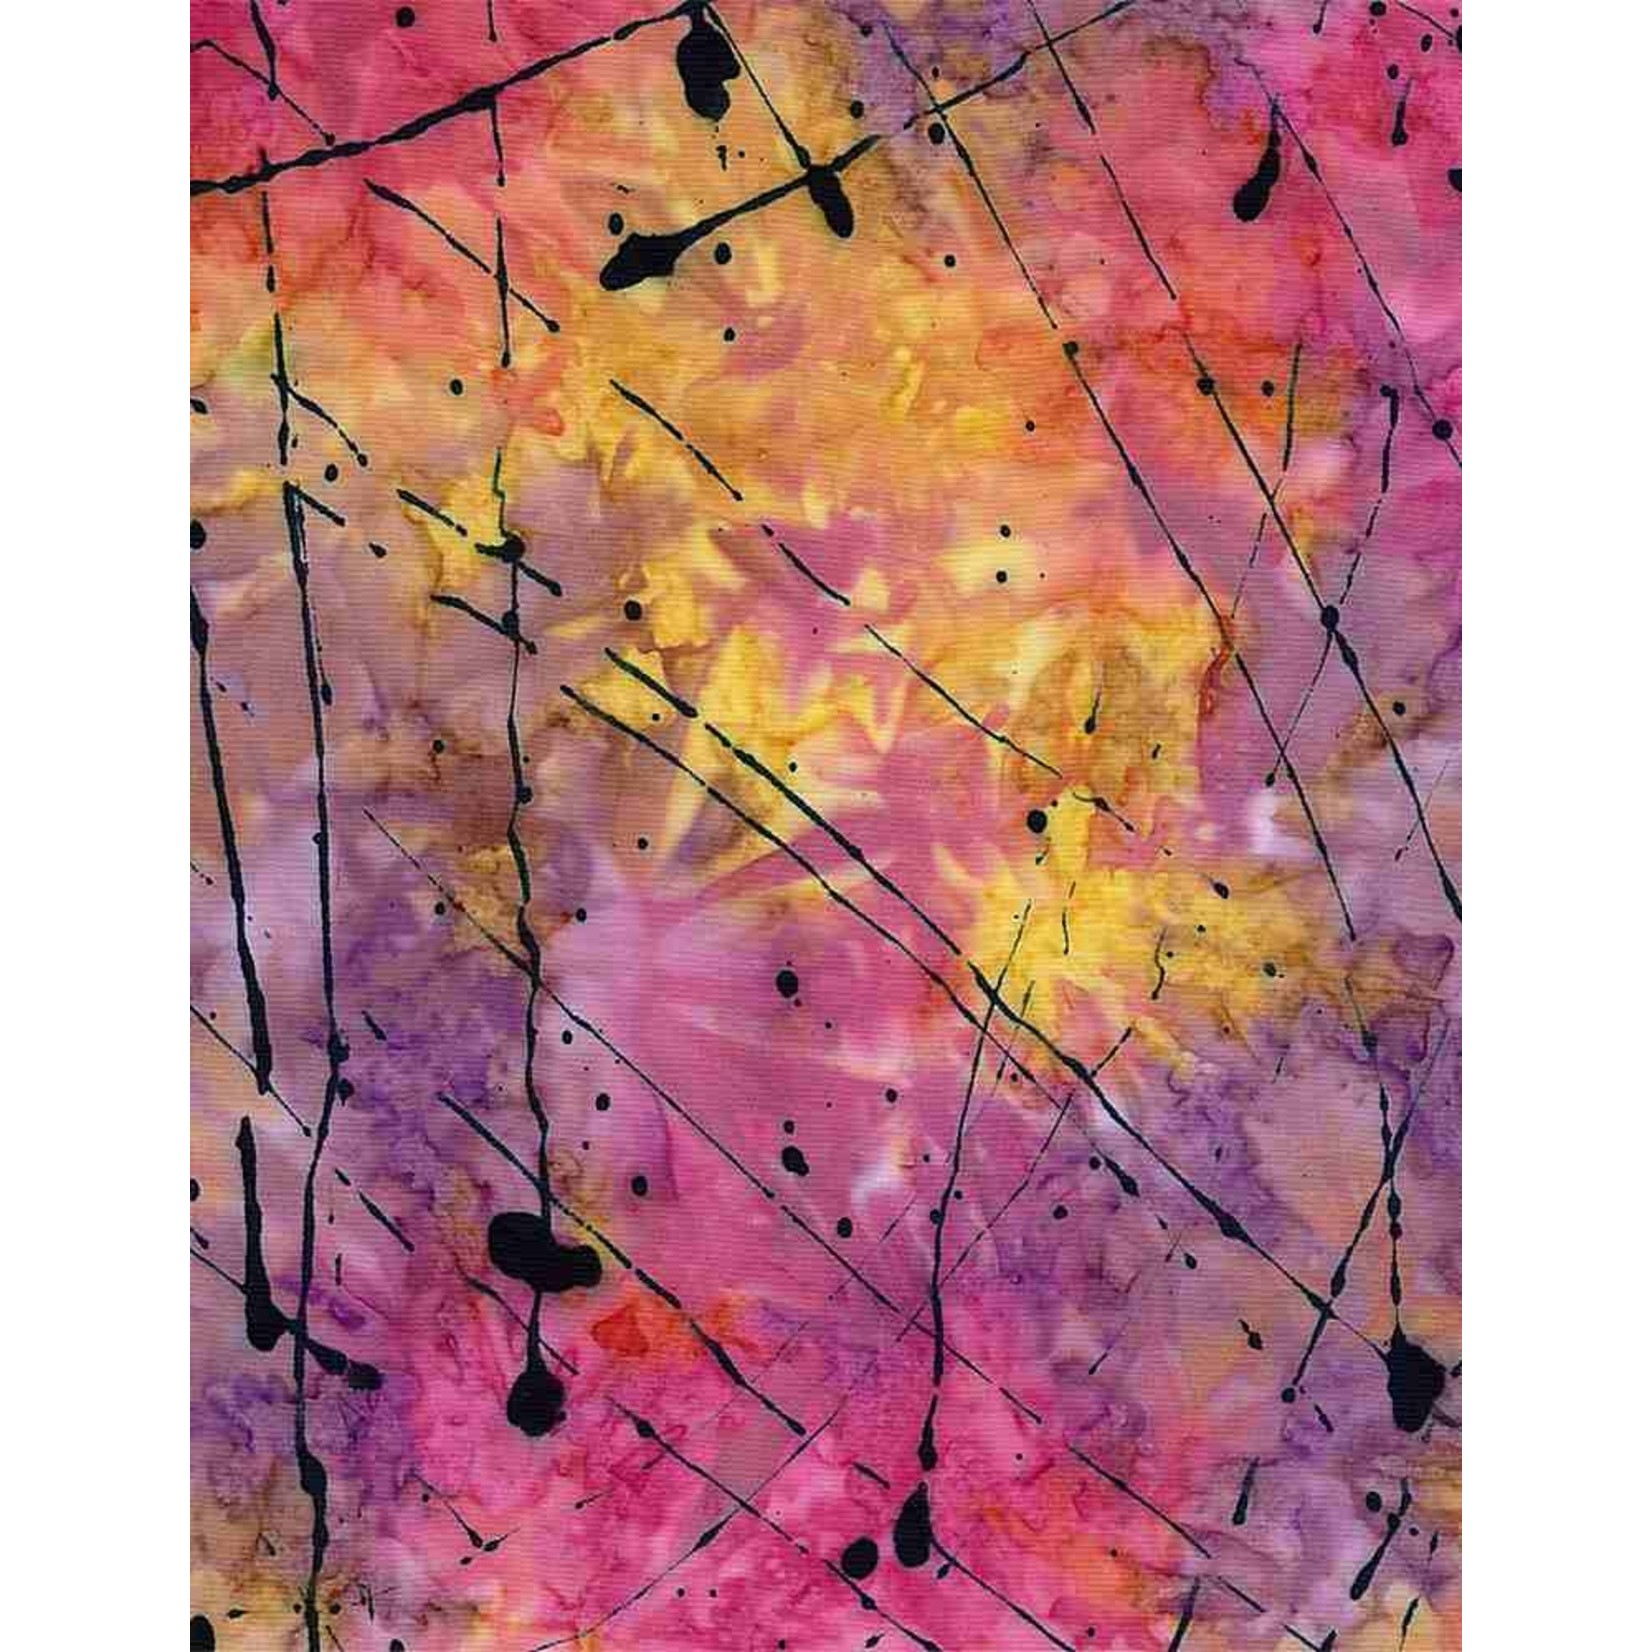 Timeless Treasures Tonga, Impact Splattered Thin Paint, Sunset $0.18 per cm or $18/m